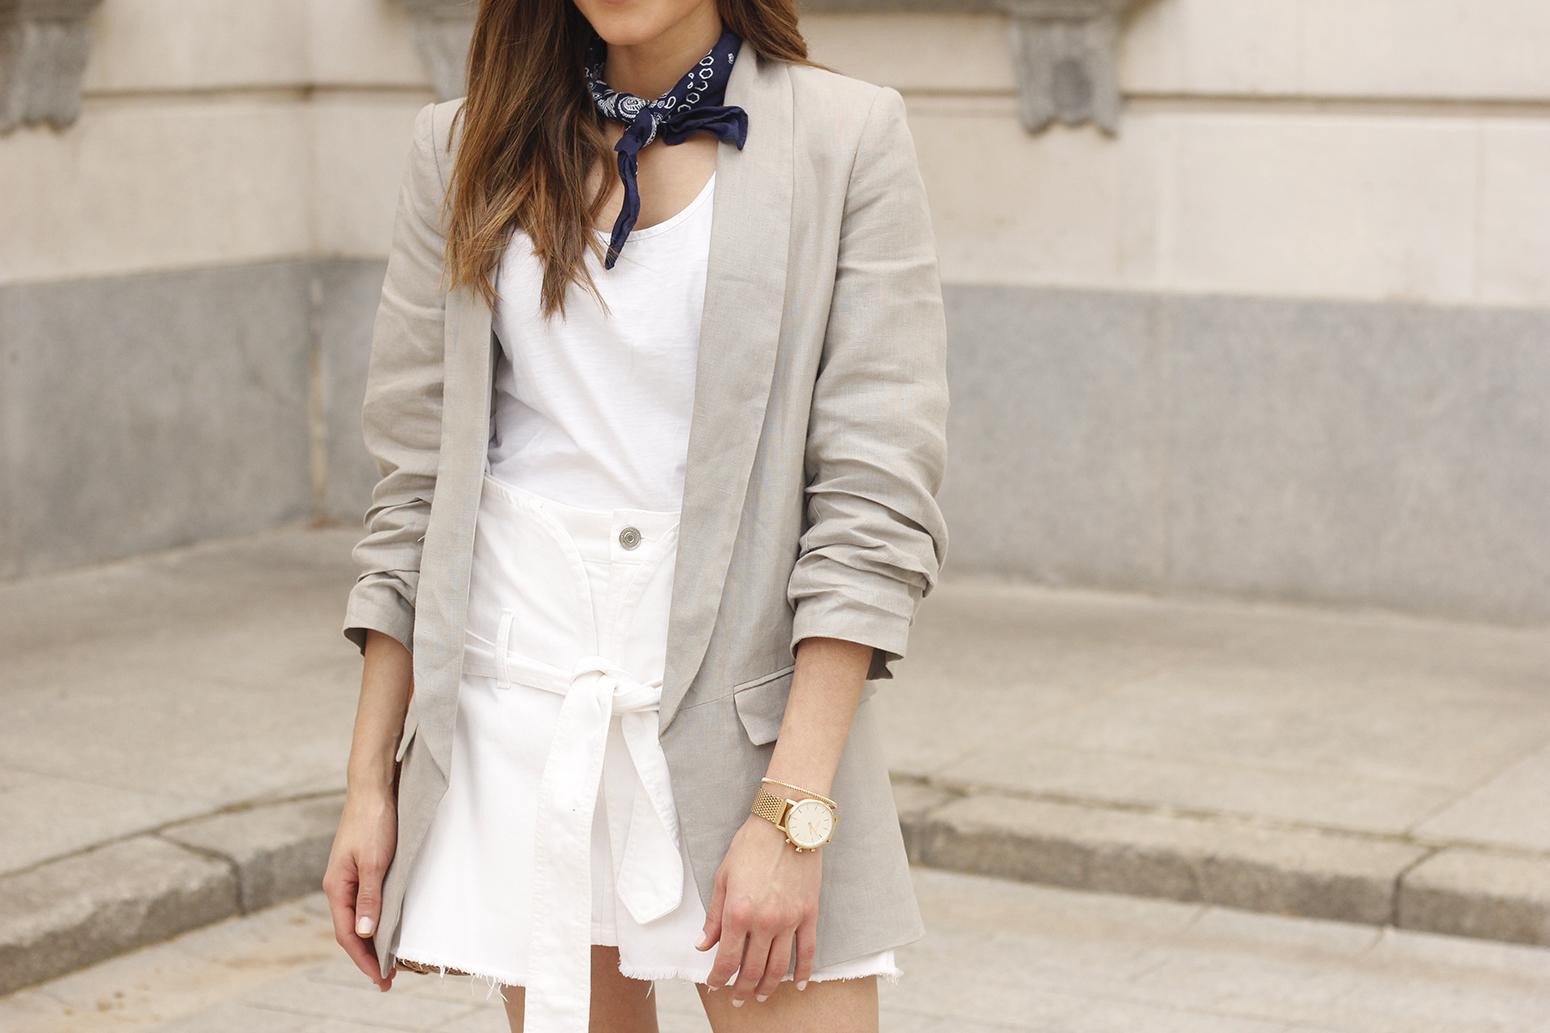 gray linen blazer blue bandana white converse bamboo bag street style oufit 201813